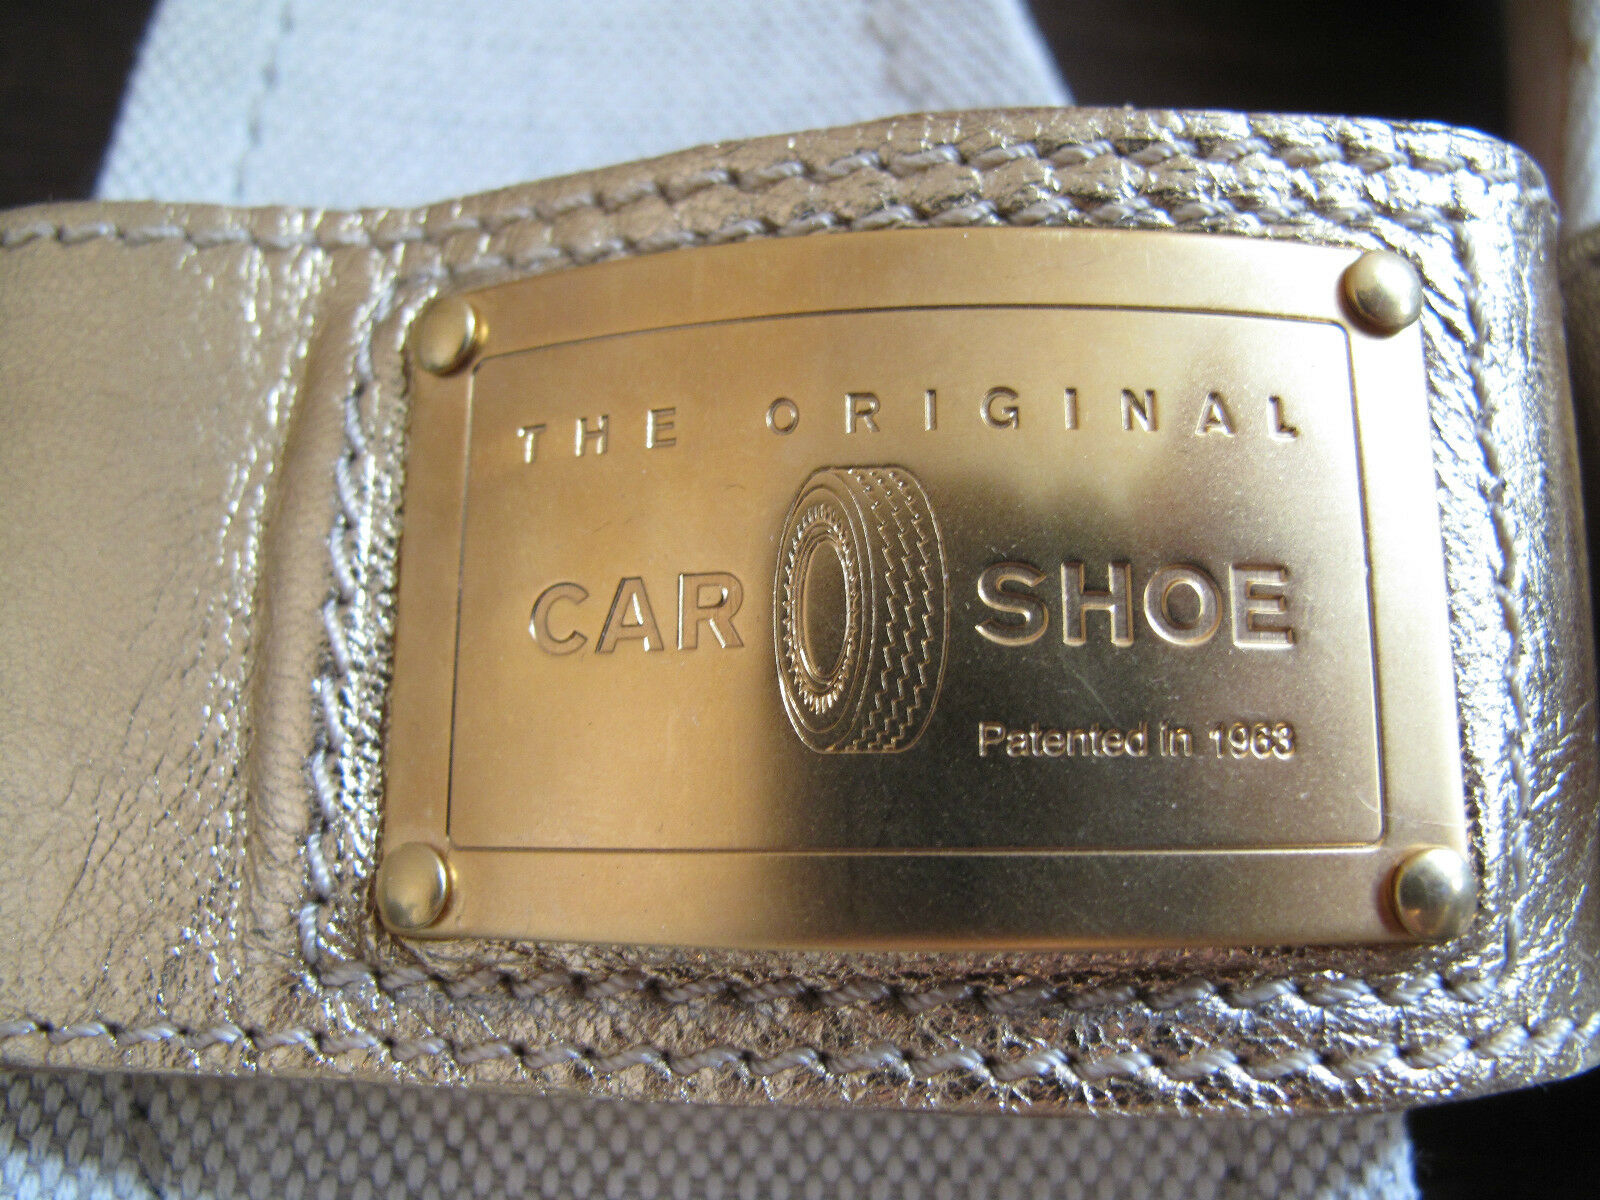 Original Car Shoe by Prada Pantoletten Sandalen 38 Echt Leder gold Gr 38 Sandalen NEU c21de1